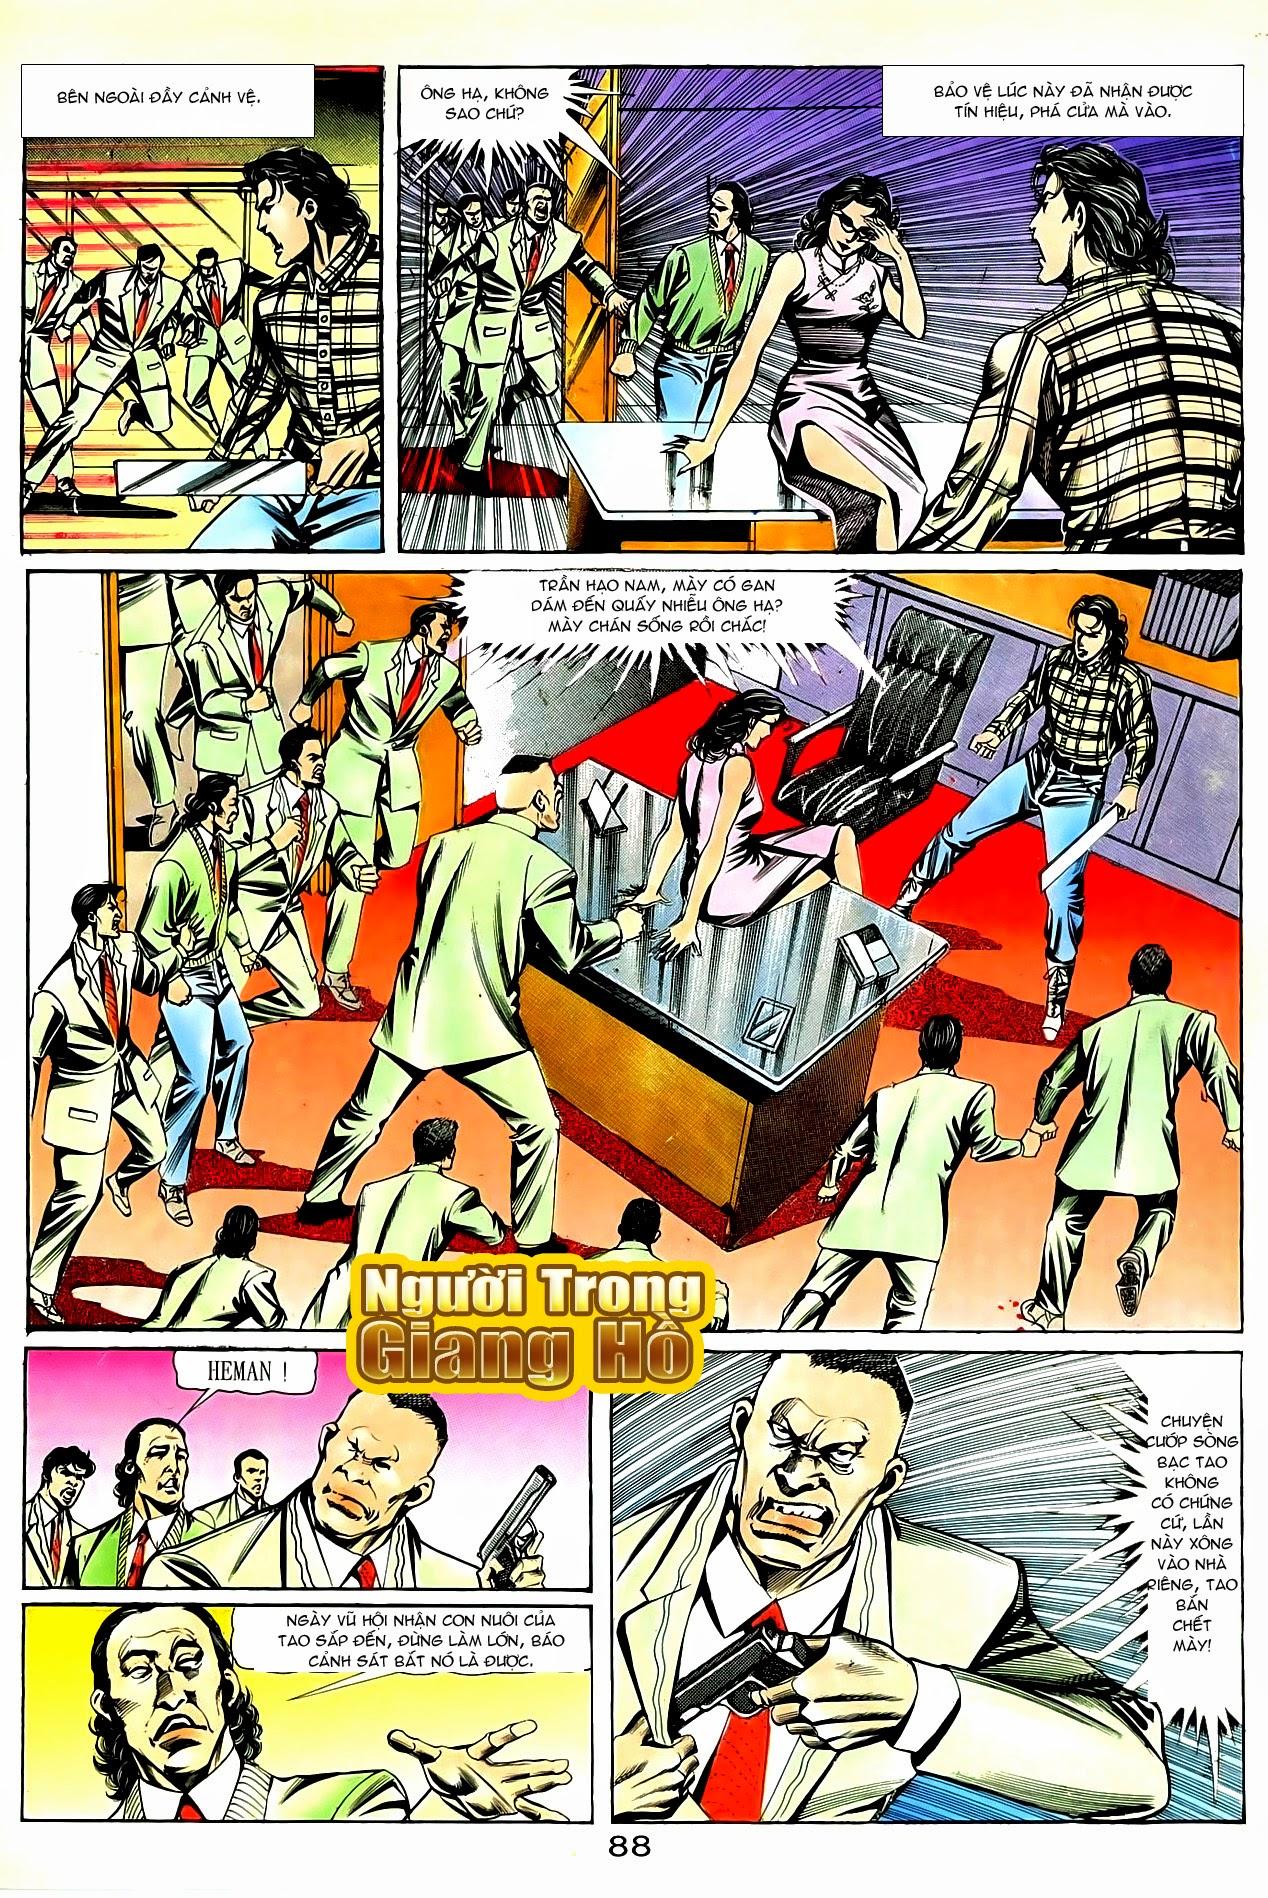 Người Trong Giang Hồ chapter 90: giang hồ hiểm trang 24